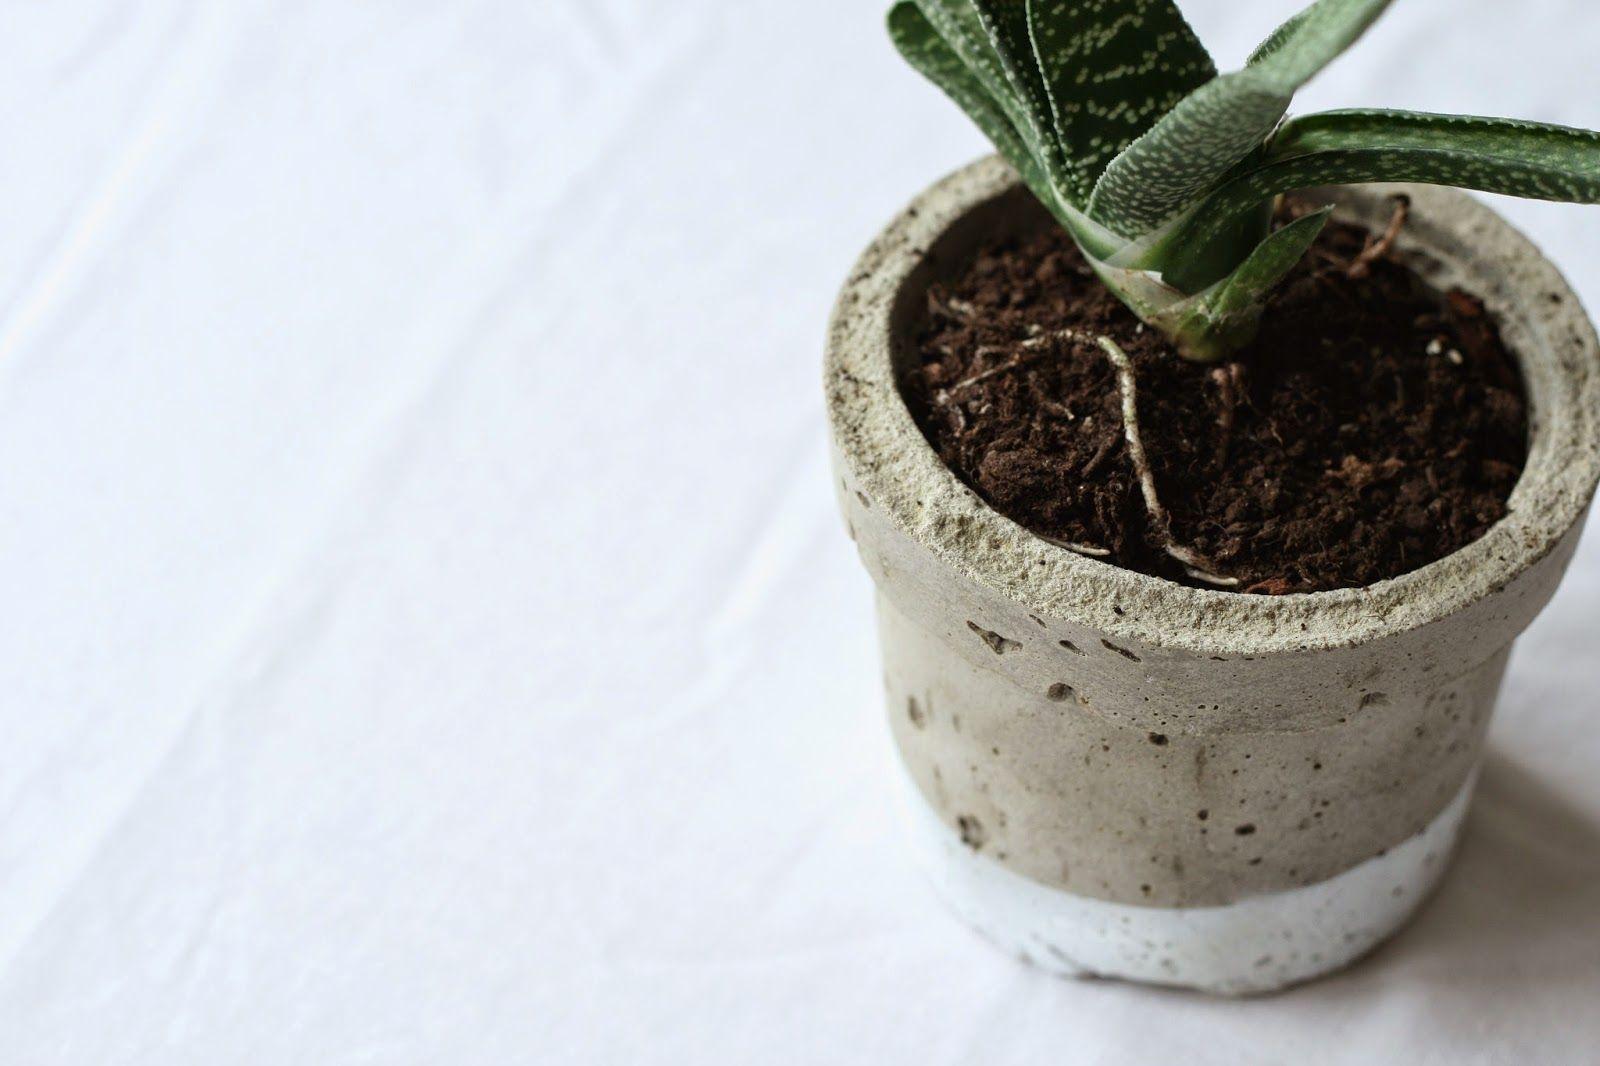 vida nullvier blumentopf aus beton our diy ideas blumentopf beton blumen und bastelideen. Black Bedroom Furniture Sets. Home Design Ideas